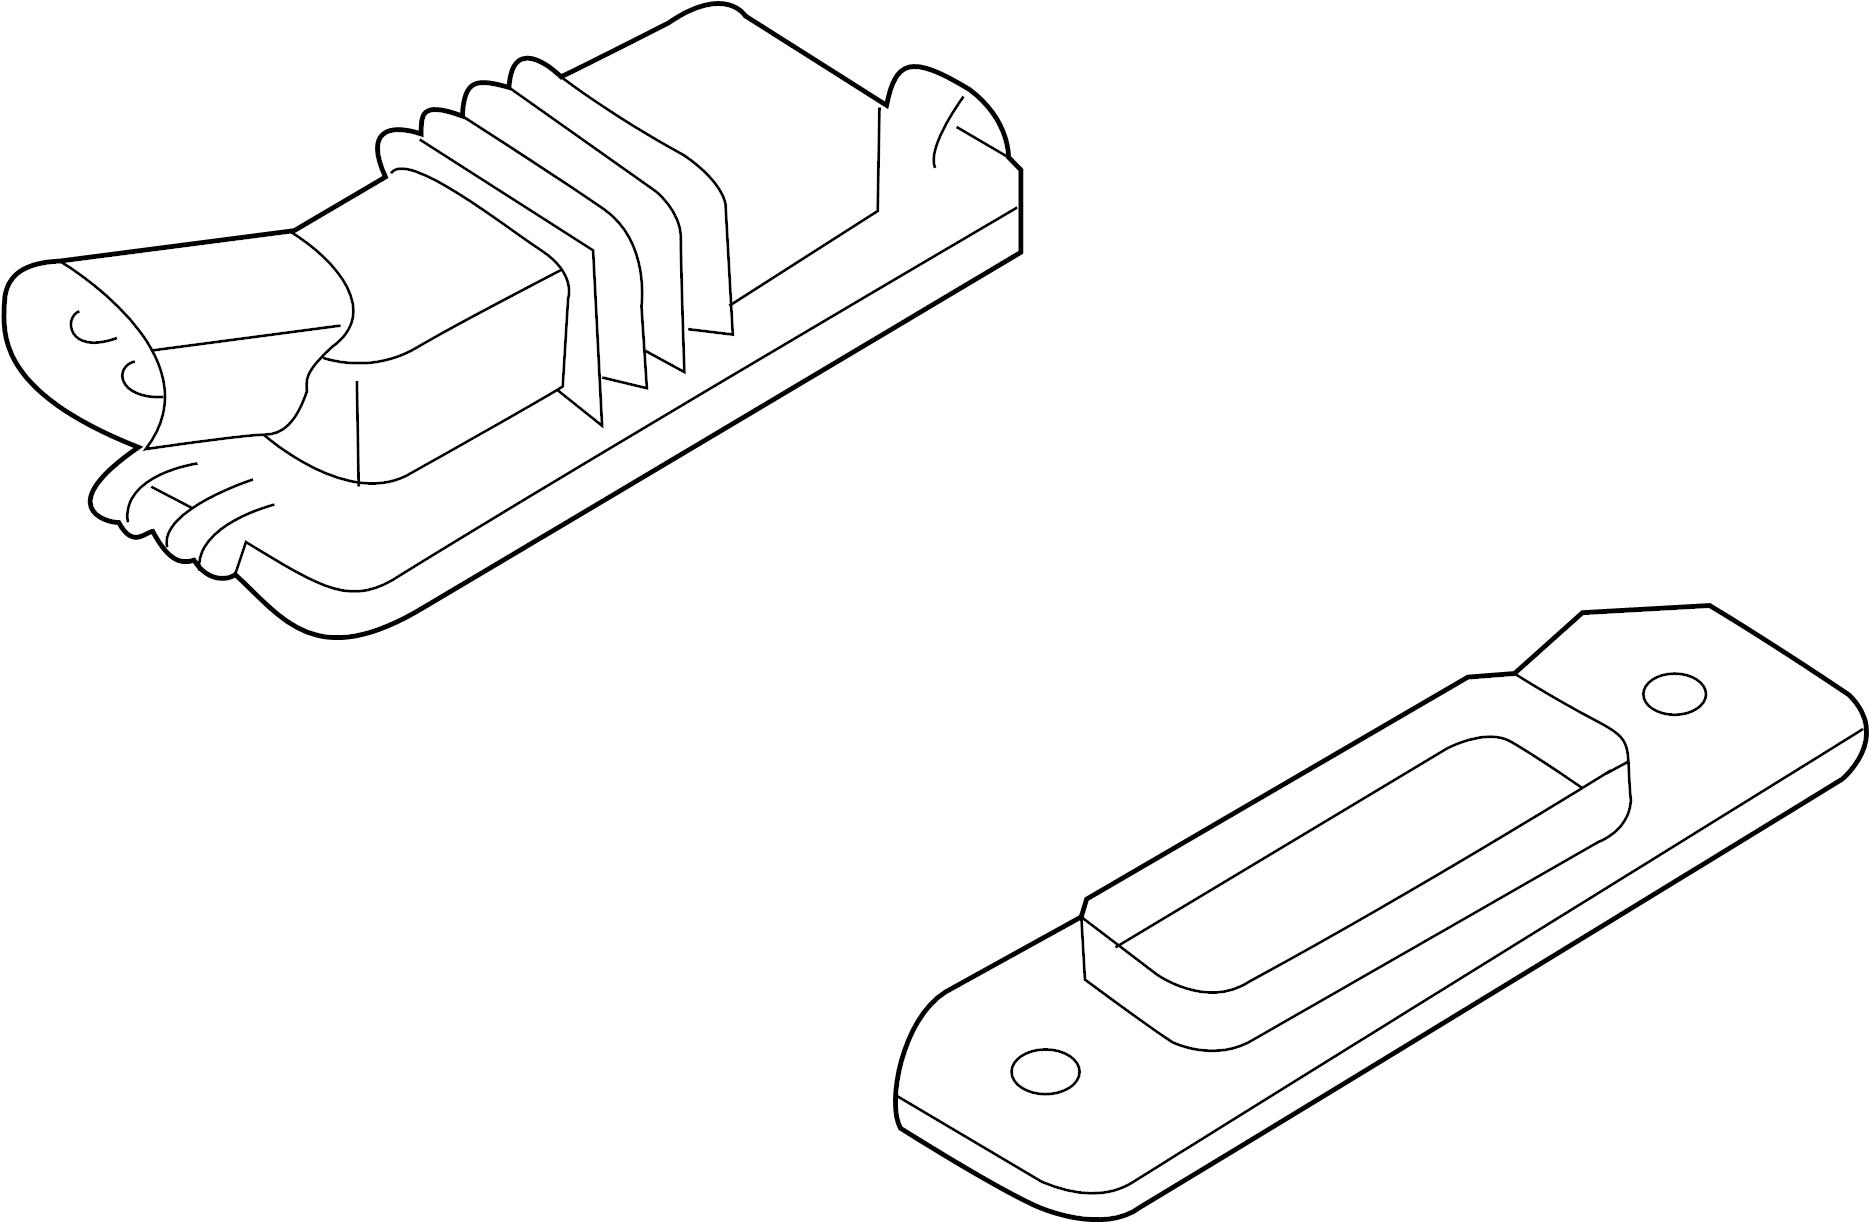 1999 Chrysler Lhs Fuse Box Diagram Wiring Library